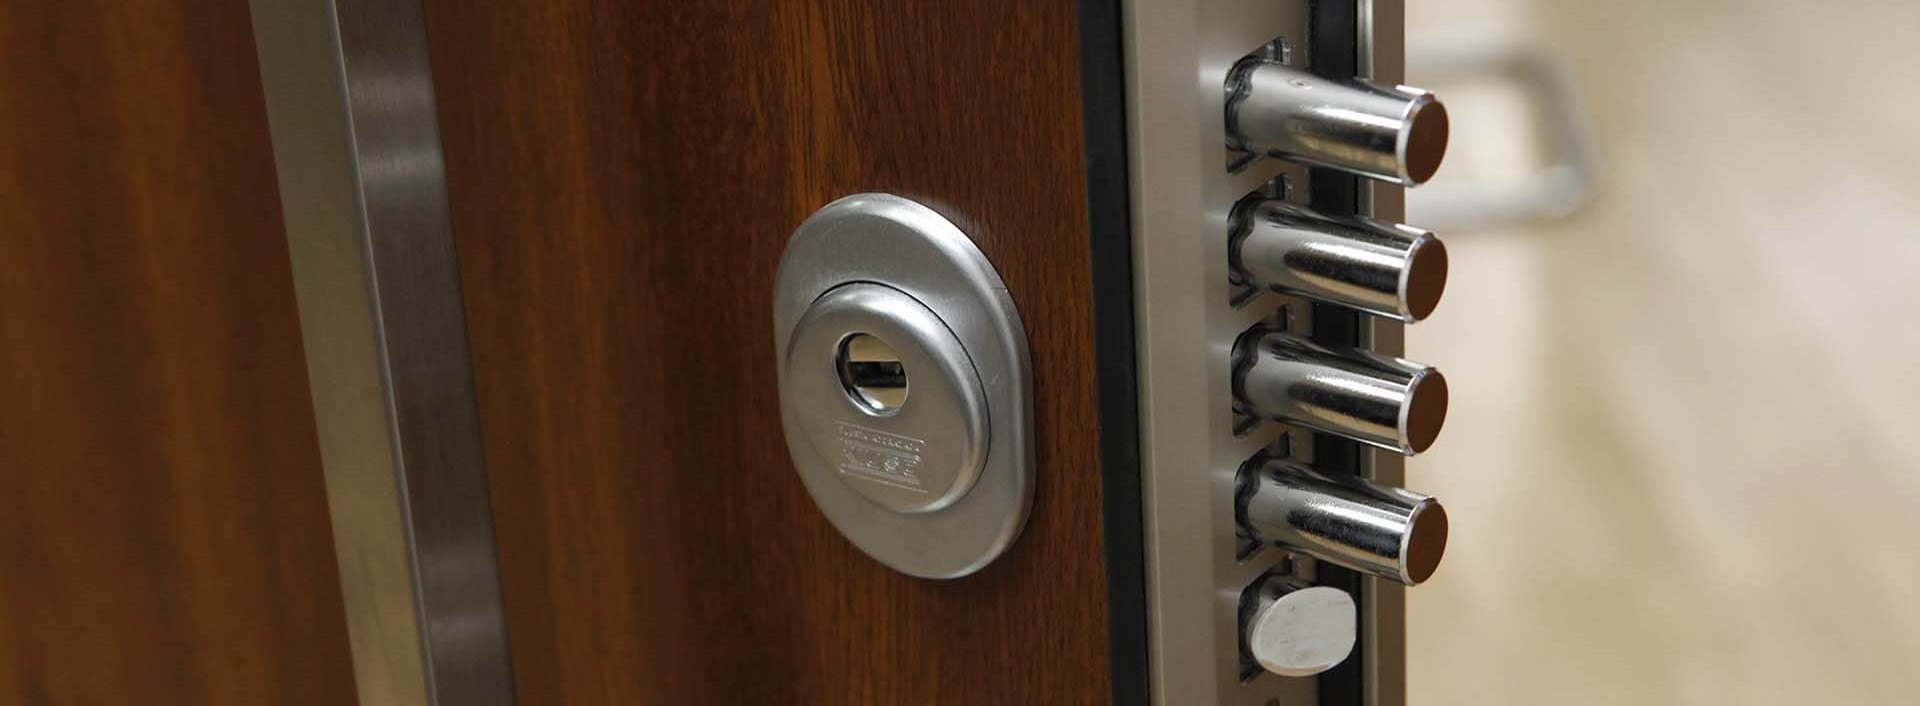 cerraduras puertas - Serruriers Barcelone